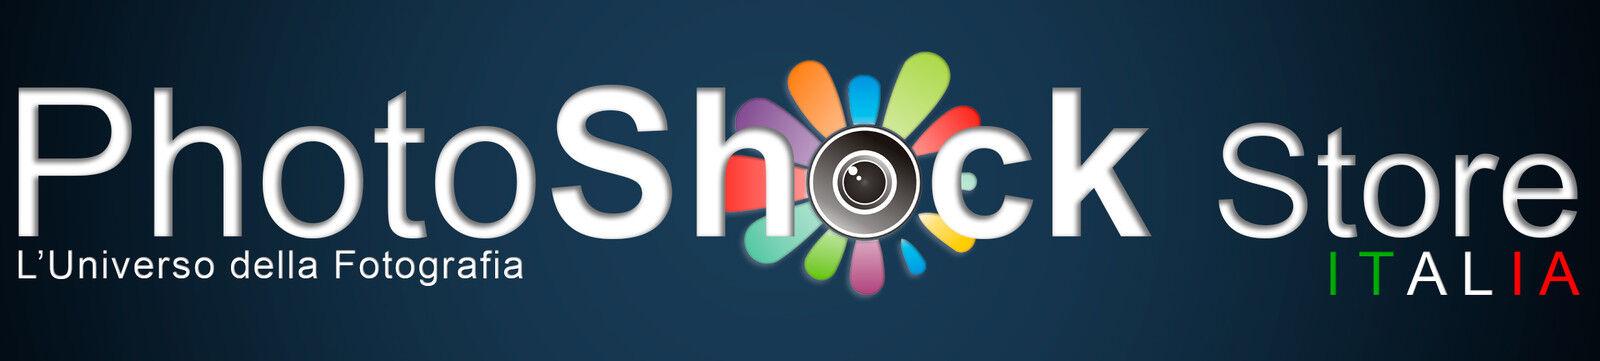 PhotoShock Store